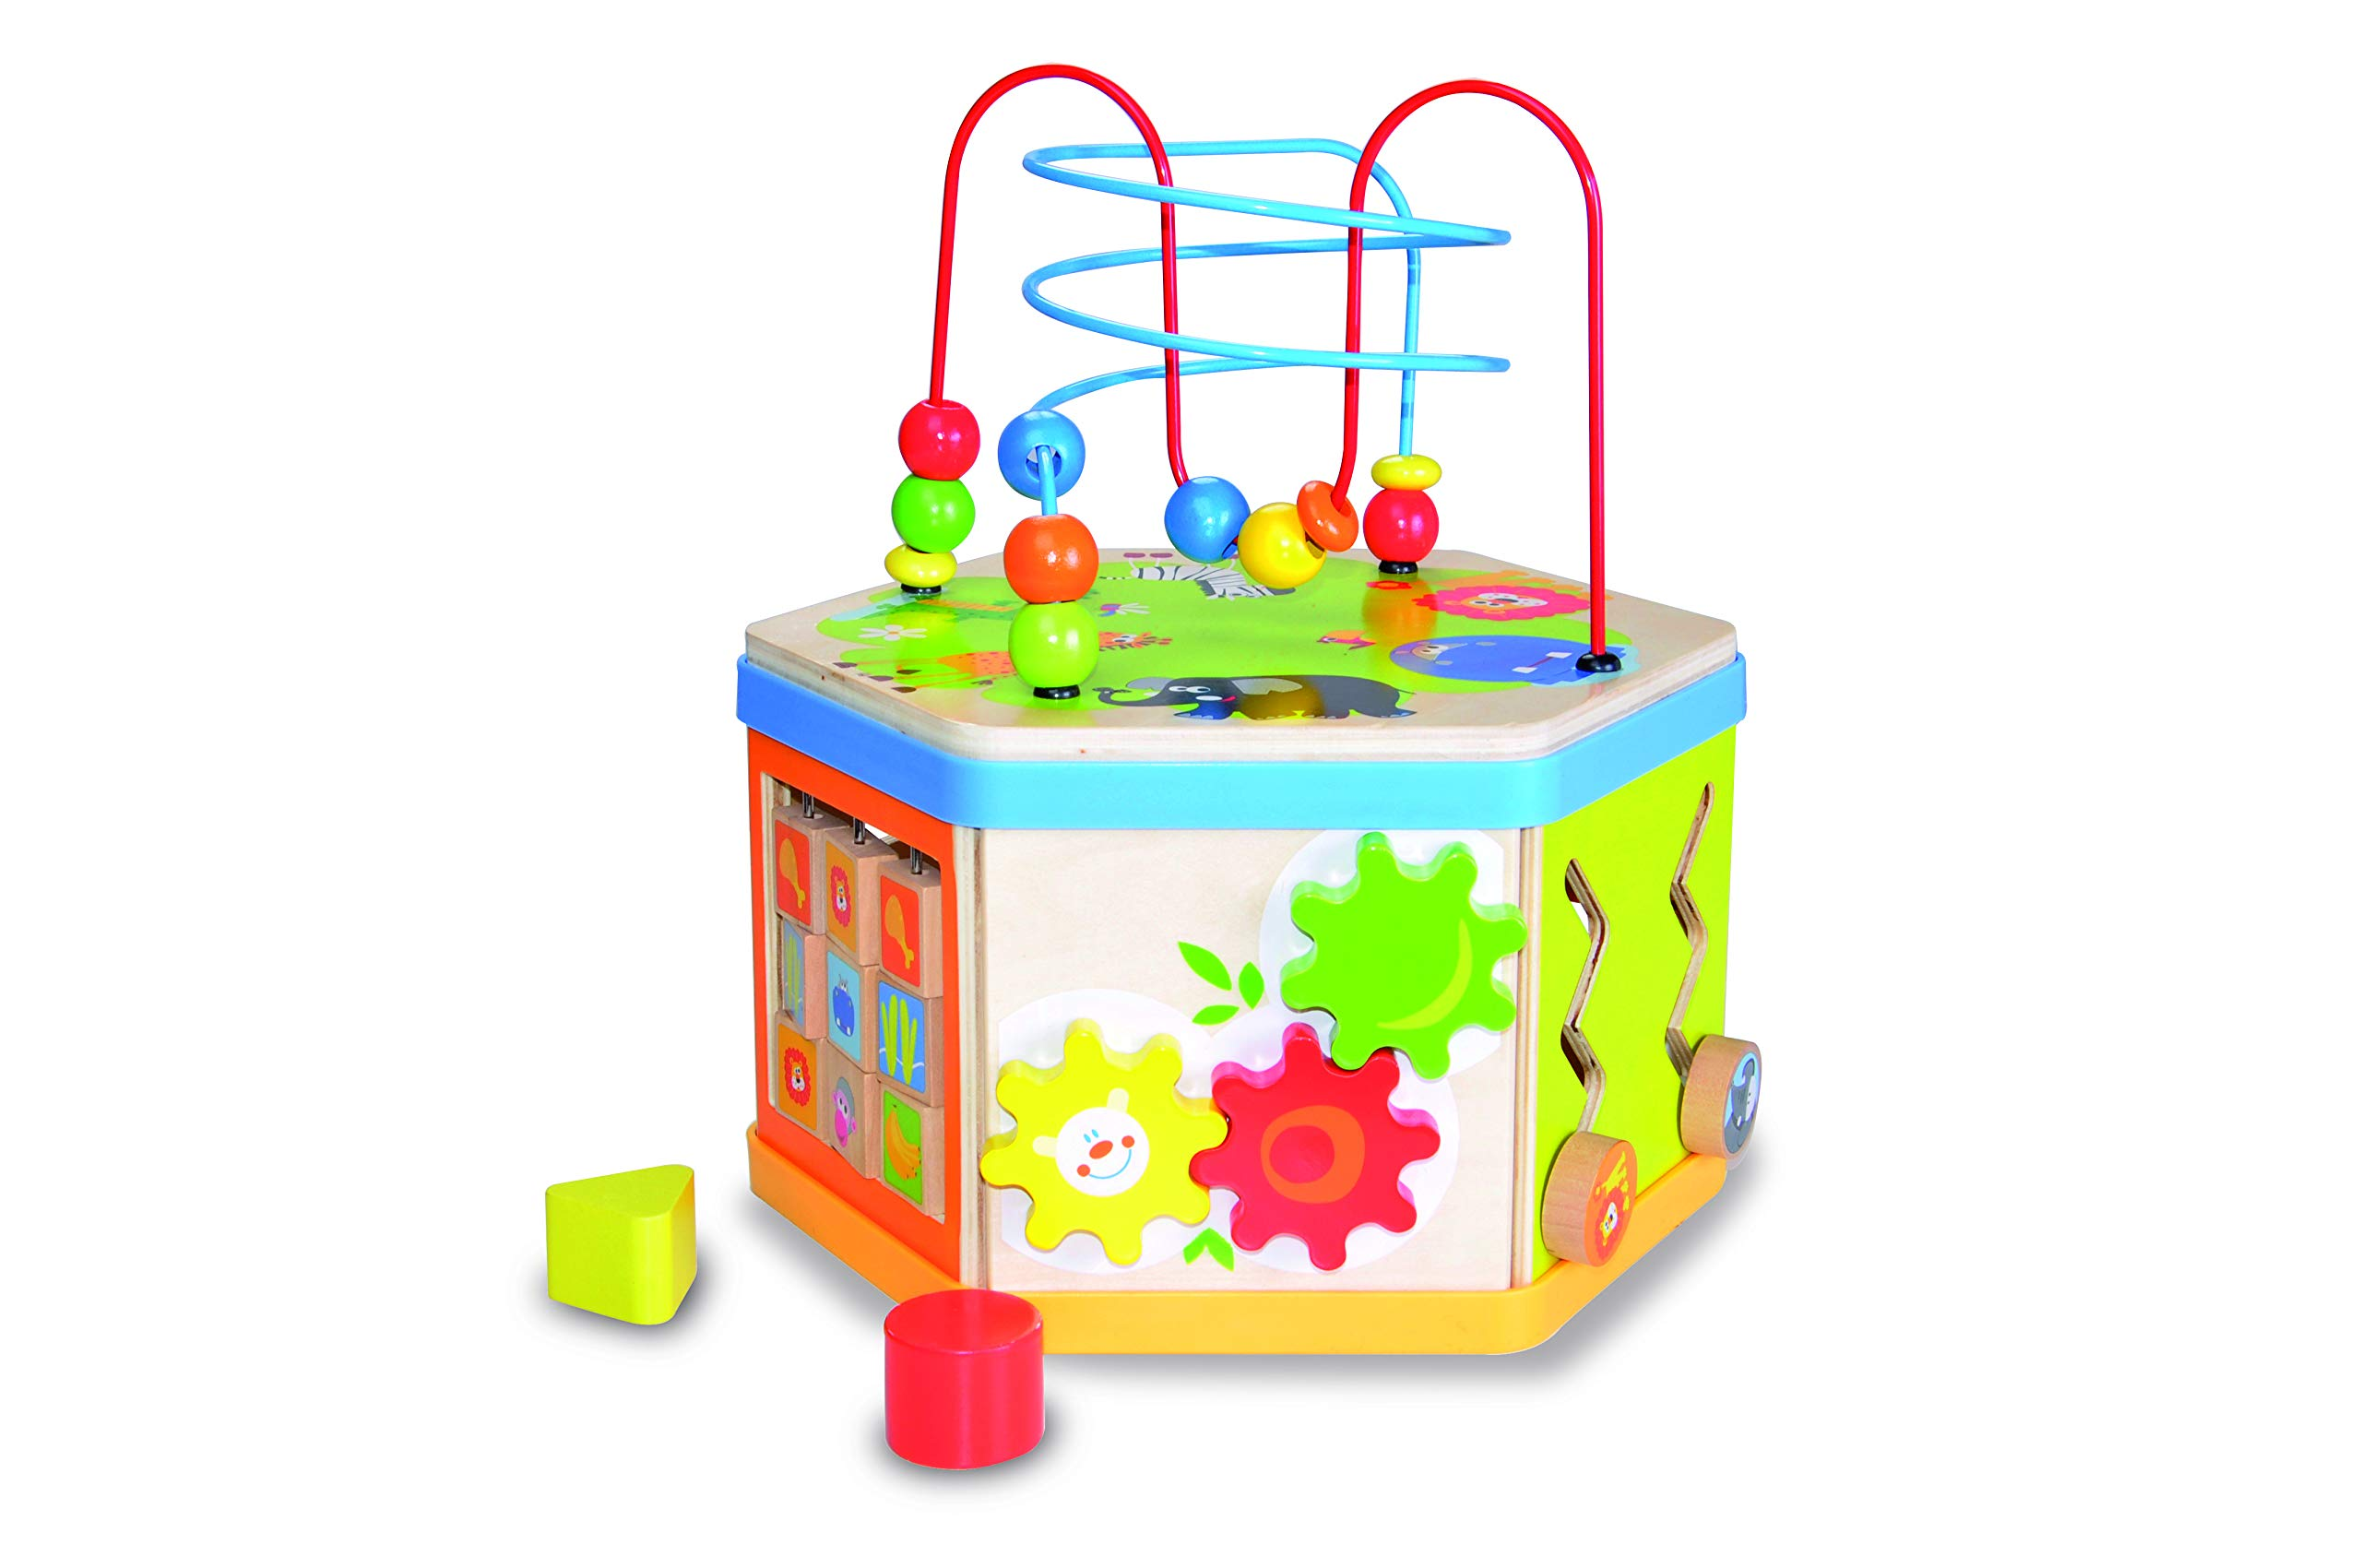 Andreu Toys TB15417 7-in-1 Activity Cube, Multi-Colour, 29 x 25.5 x 31 cm